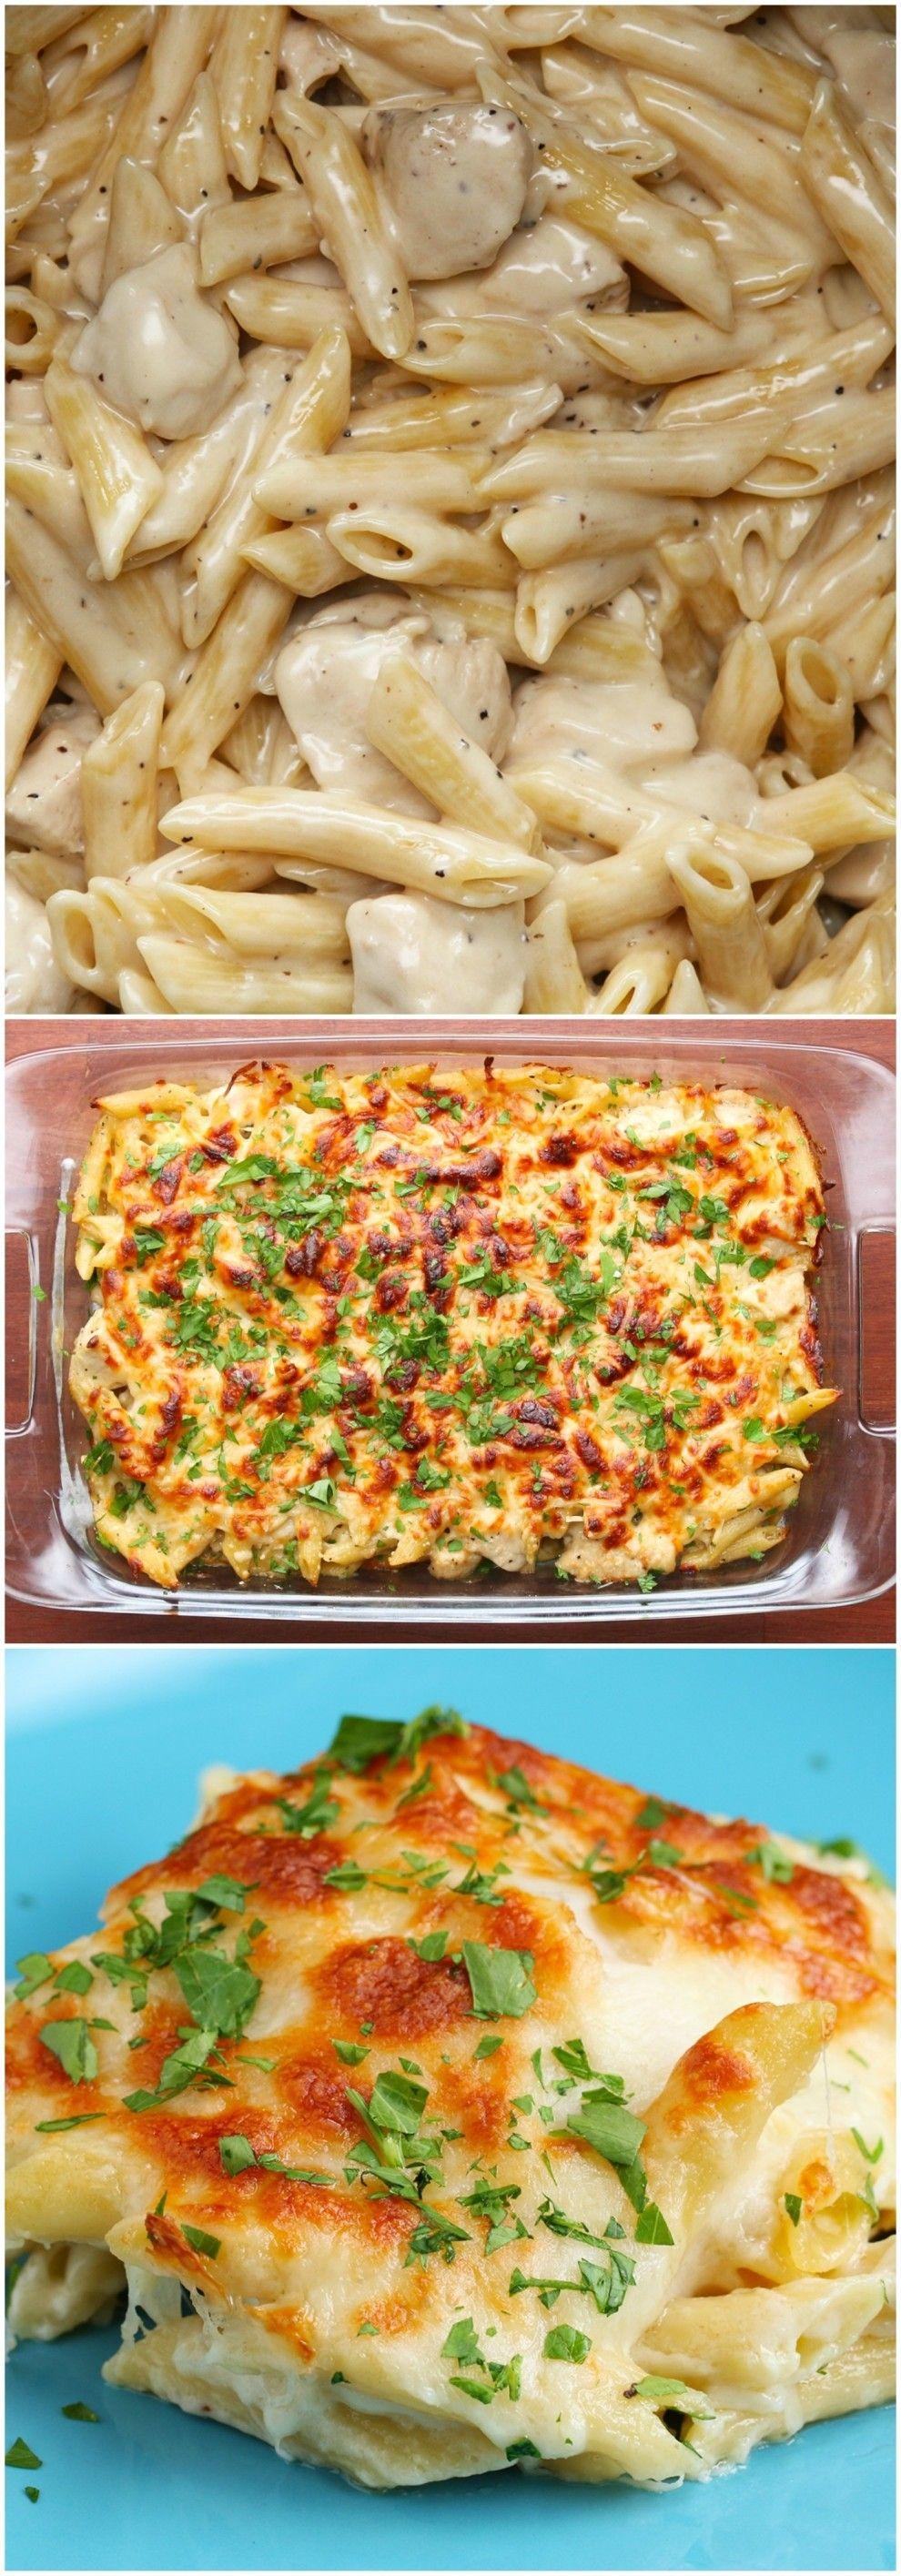 Cheesy Chicken Alfredo Pasta Bake  Recipe  Baked Pasta -3137